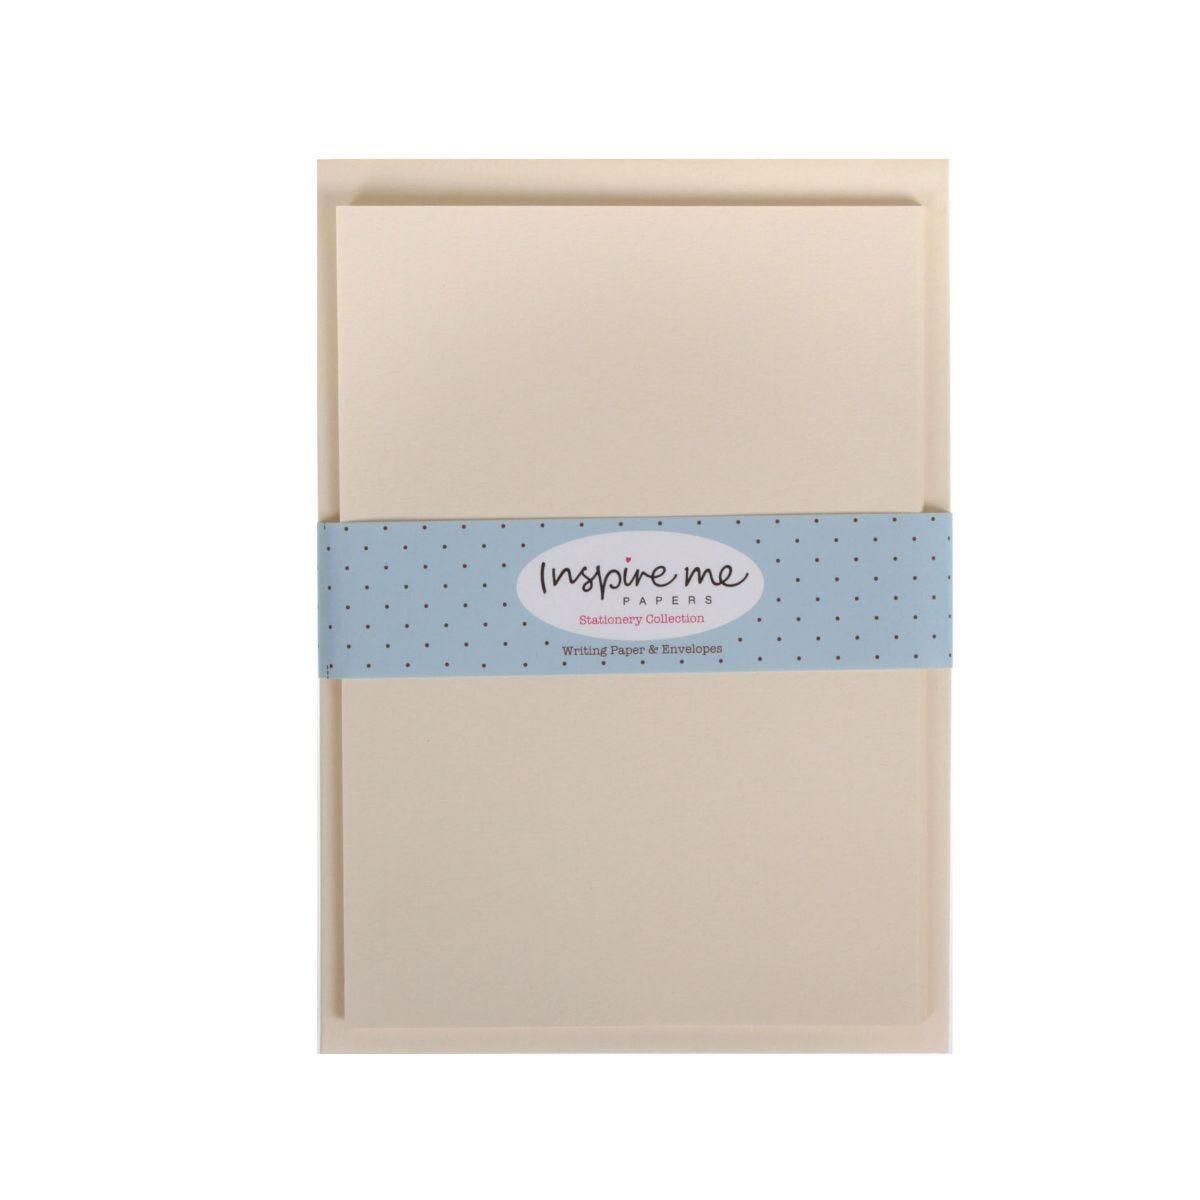 Inspire Me Writing Paper and Envelopes 20 Sheets 10 Envelopes Cream